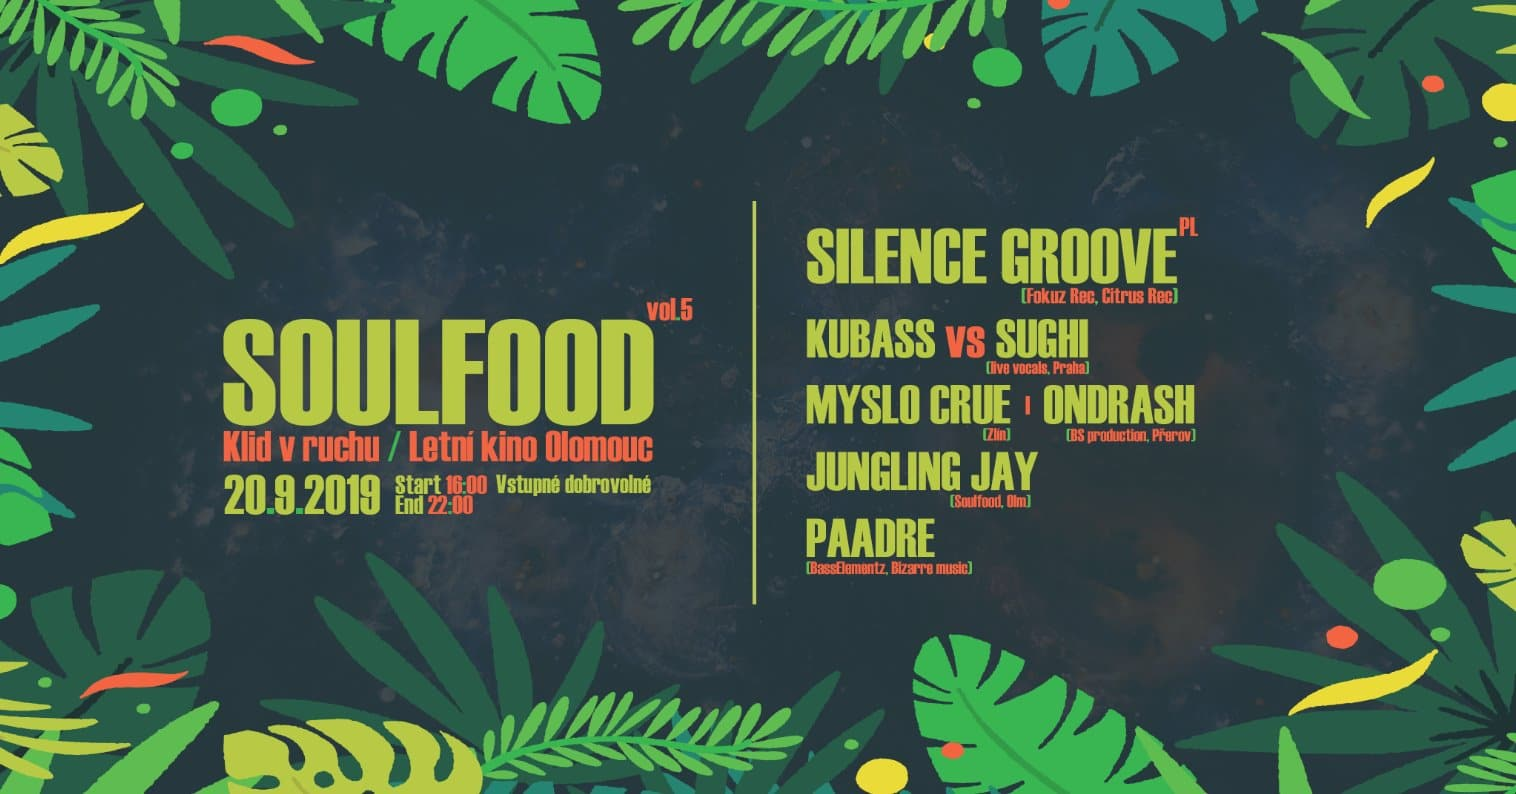 Soulfood vol. 5 w/ Silence Groove /PL/ & Kubass vs MC Sughi